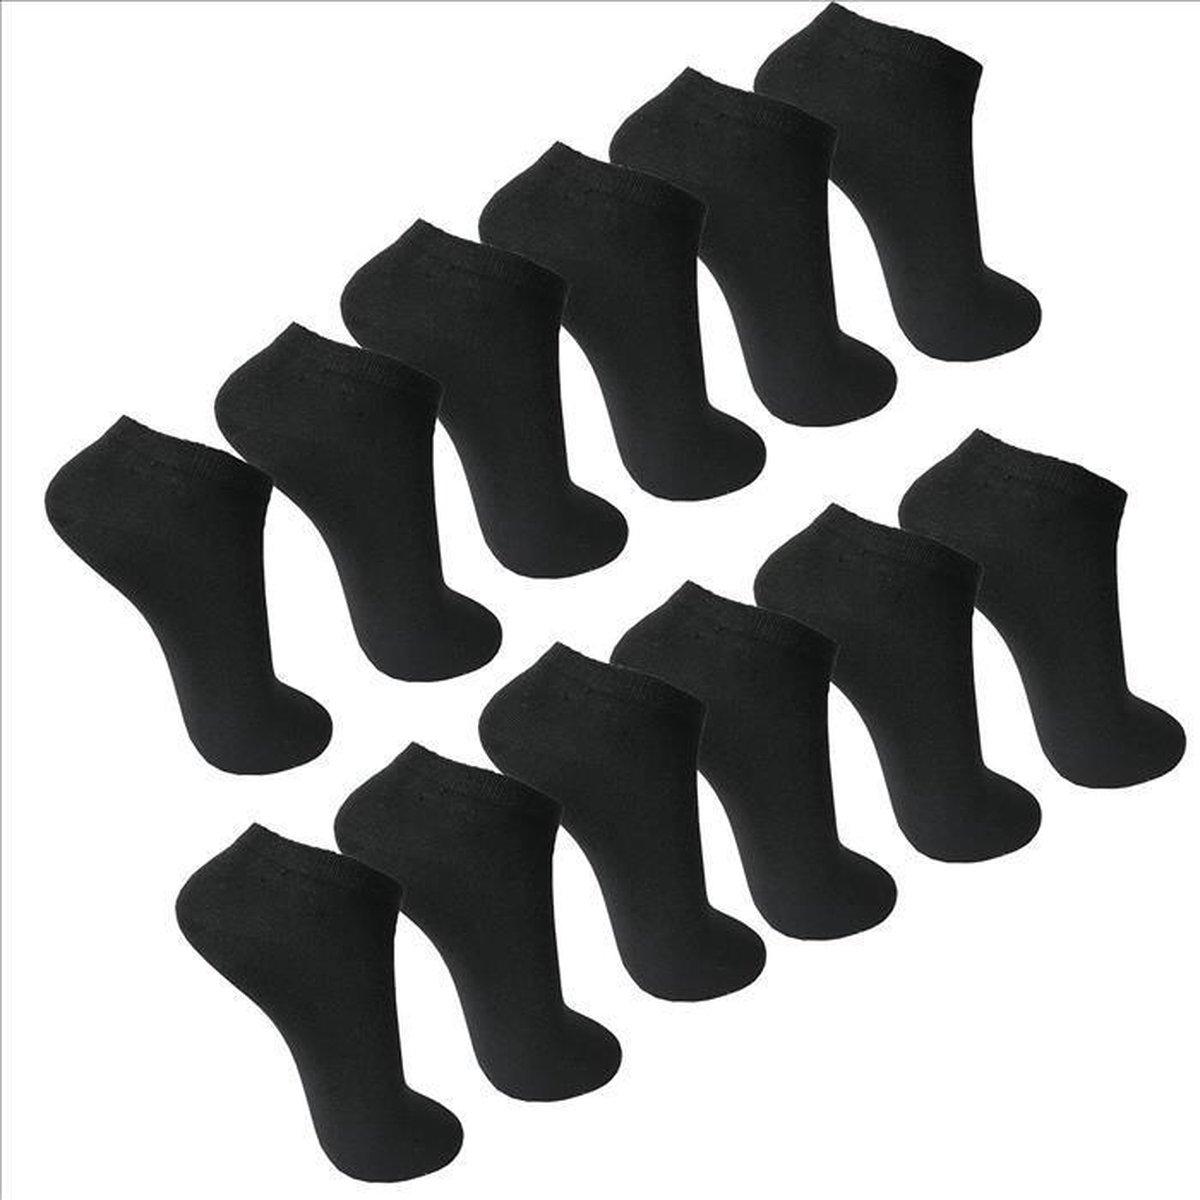 6 Paar Enkel Sokken Sneaker Socks © Maat 39/42 Kleur Zwart Multipack Unisex Maat 39/42 - Effe Zwart